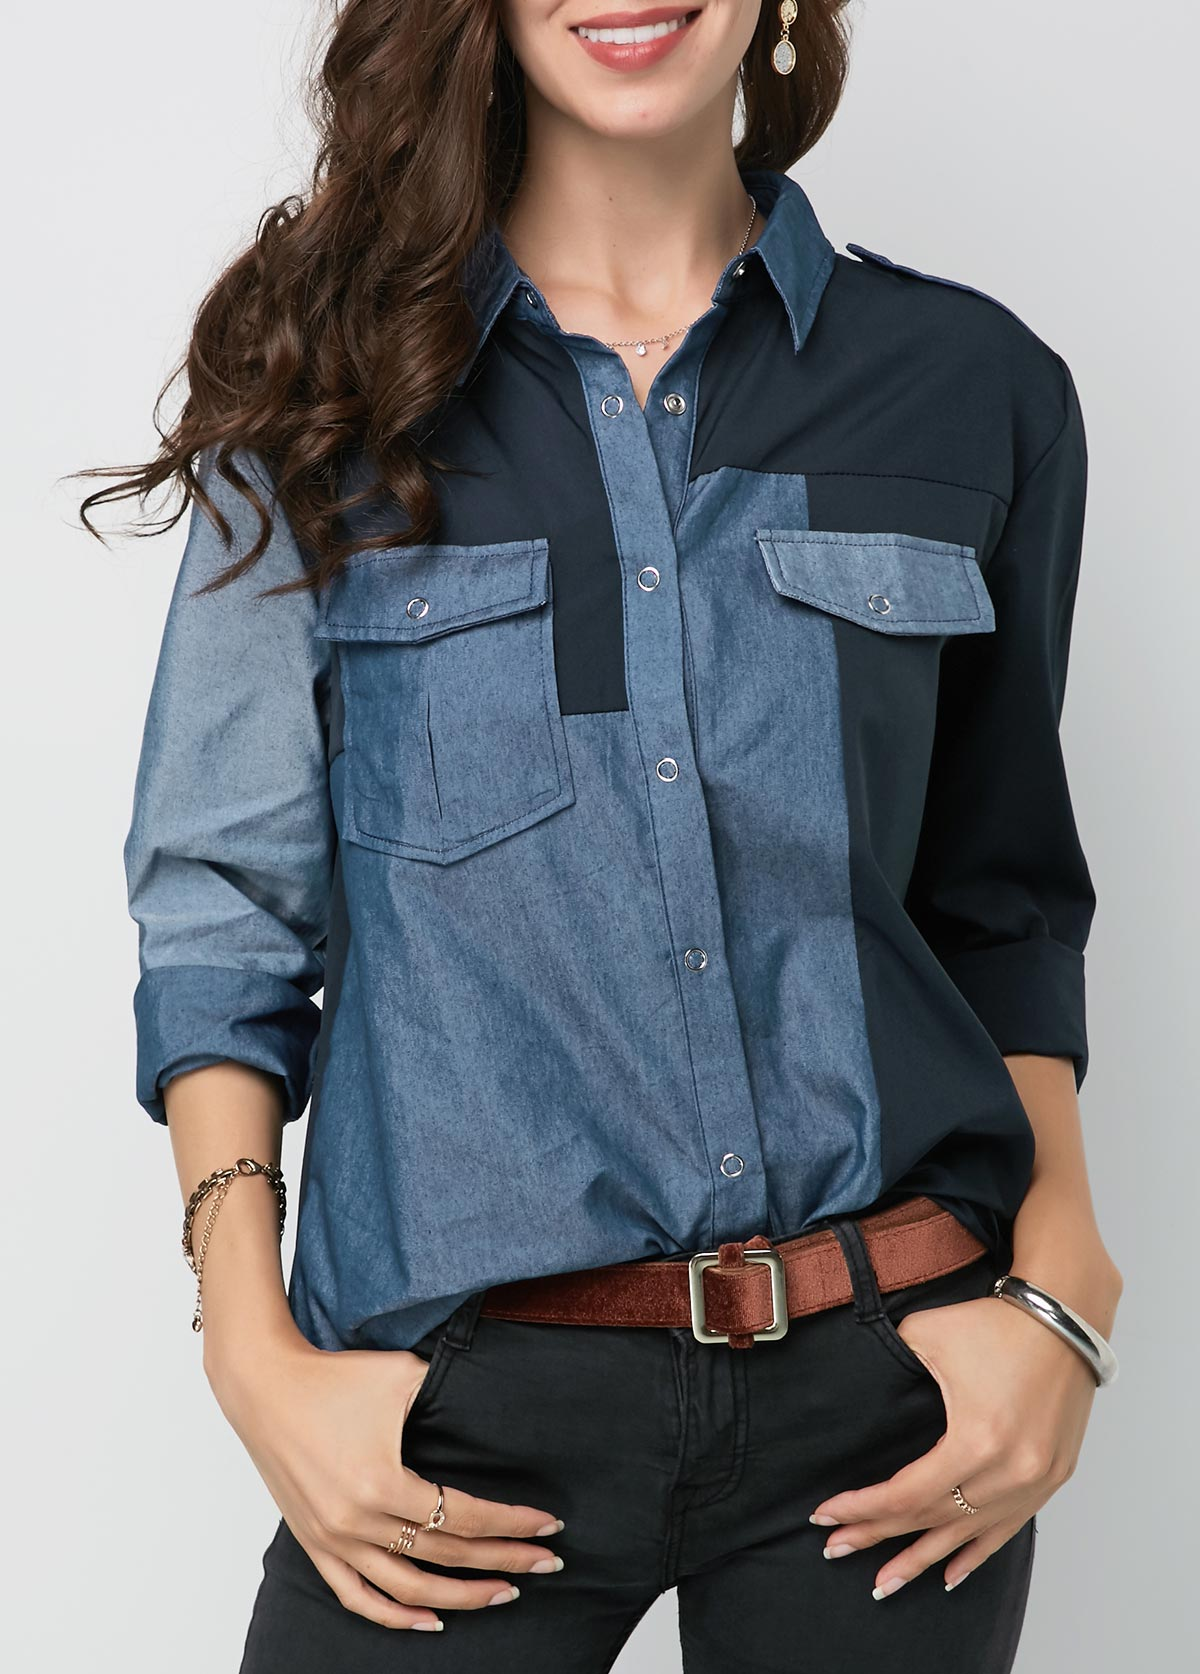 Turndown Collar Button Up Long Sleeve Shirt